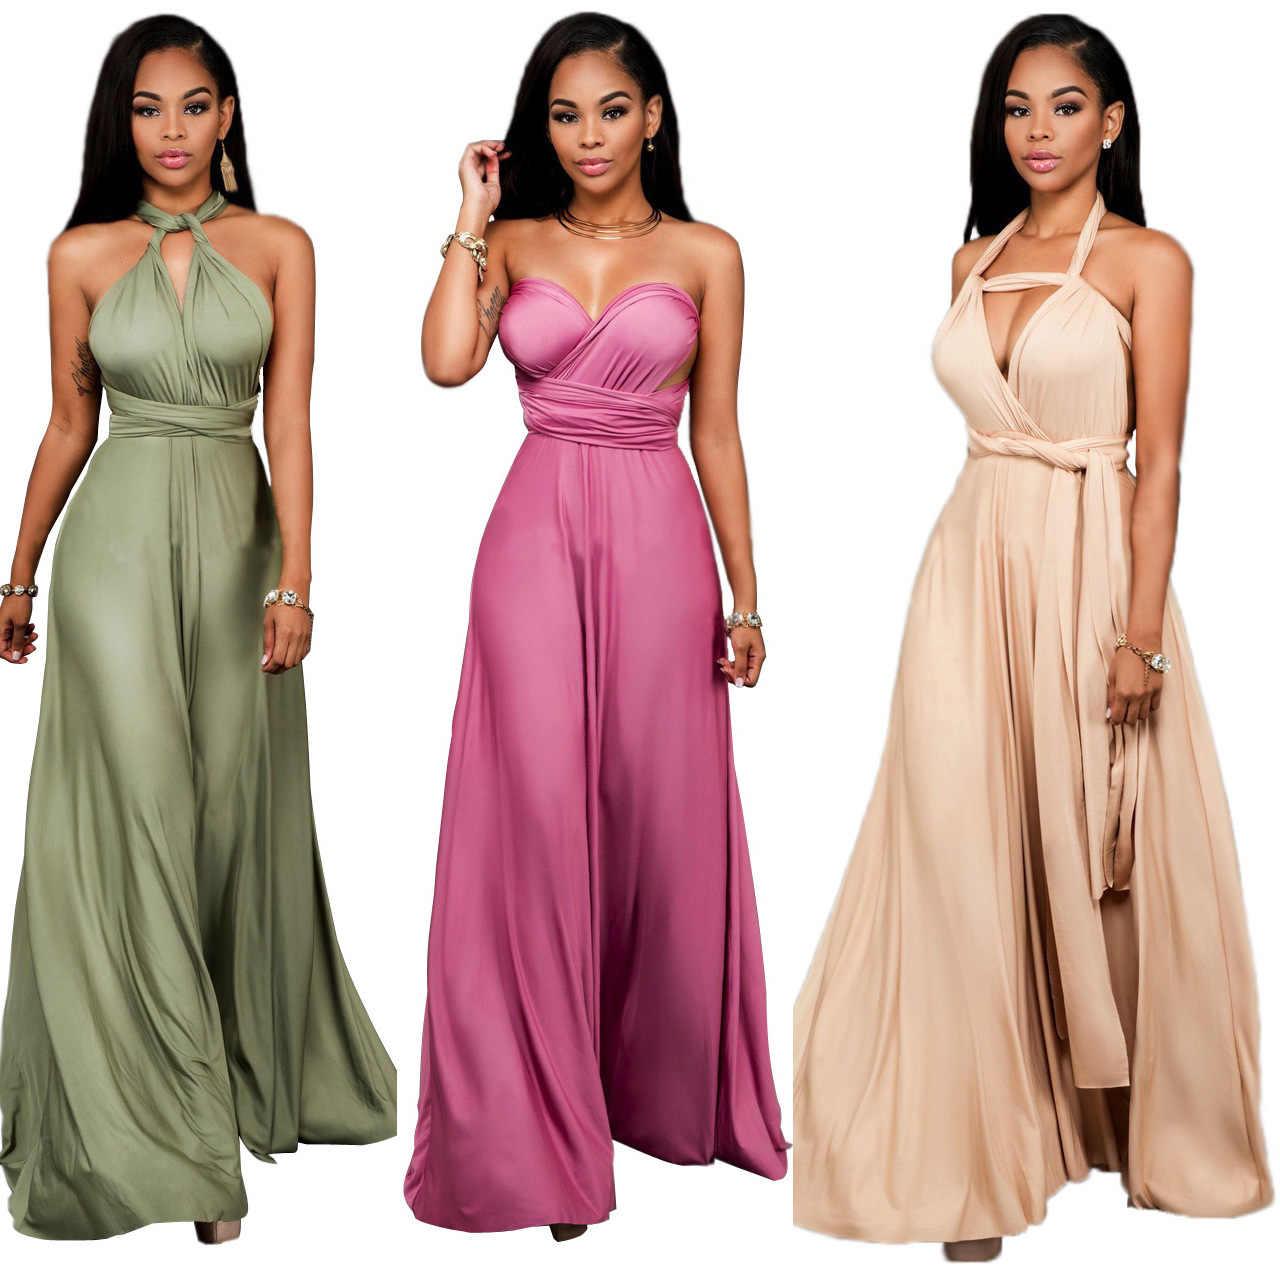 635f5e10a0 Women evening long dress elegant Formal Maxi dress Multi Way Wrap  Convertible Infinity dresses Strapless Plus Size Vintage Dress